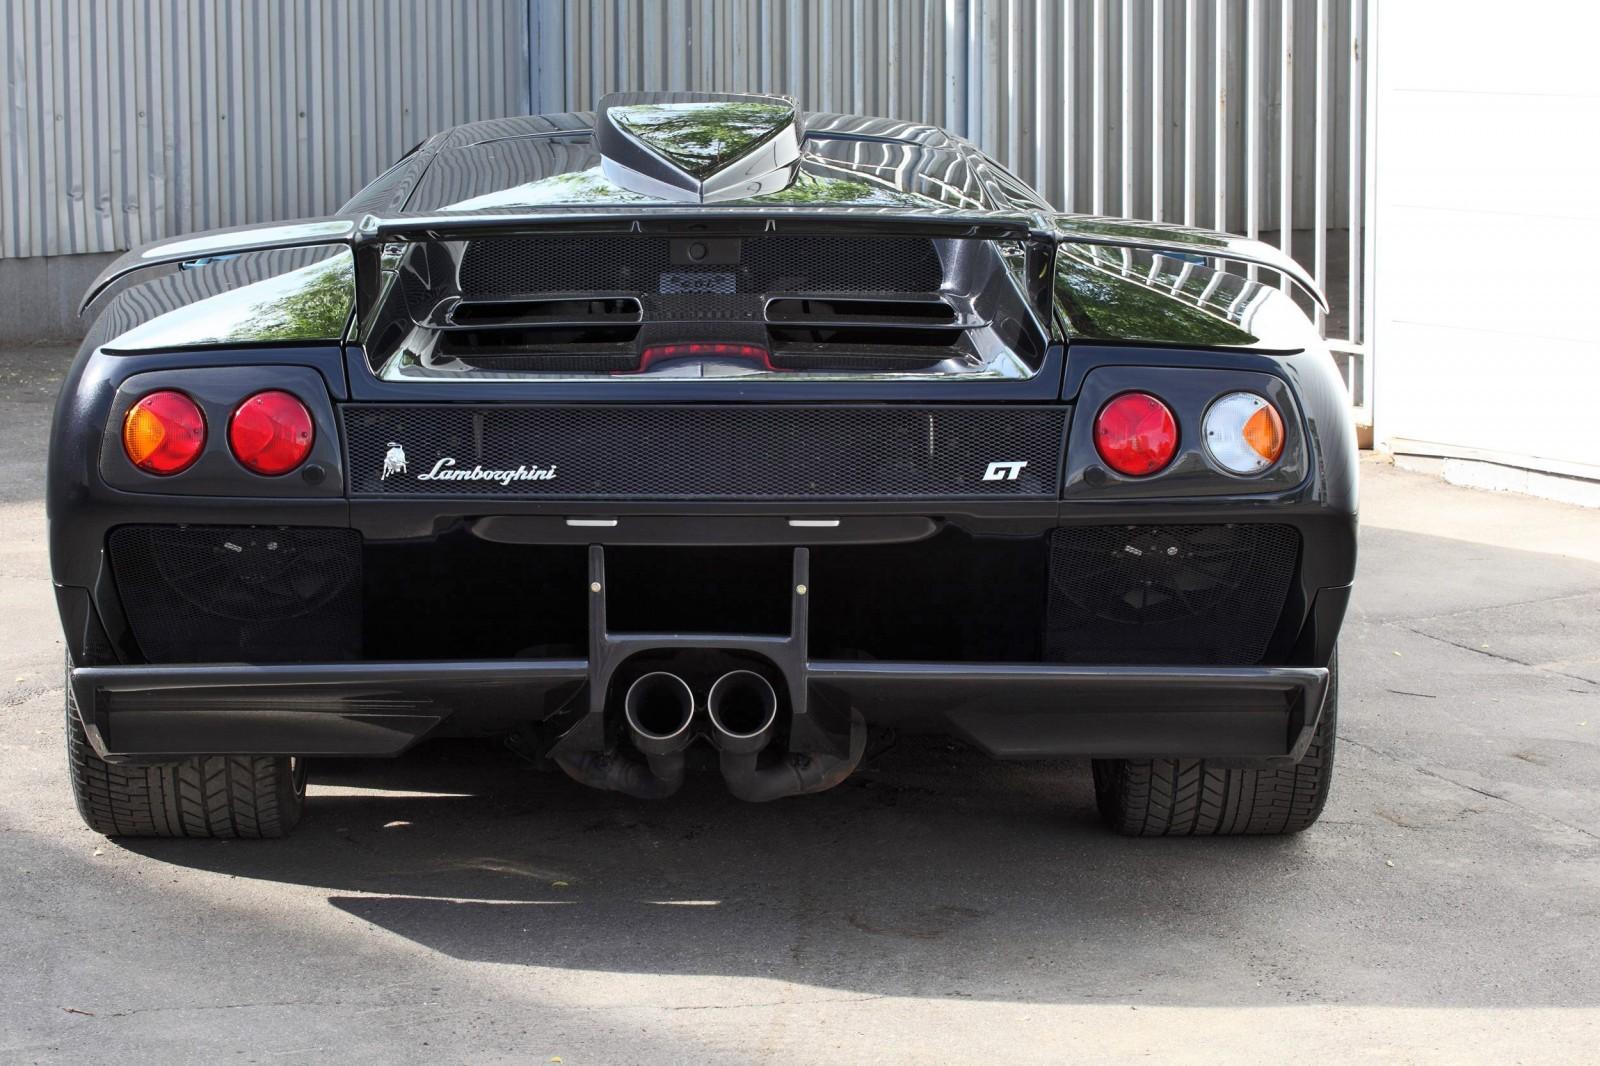 TOPCAR Classics 1999 Lamborghini Diablo GT 19